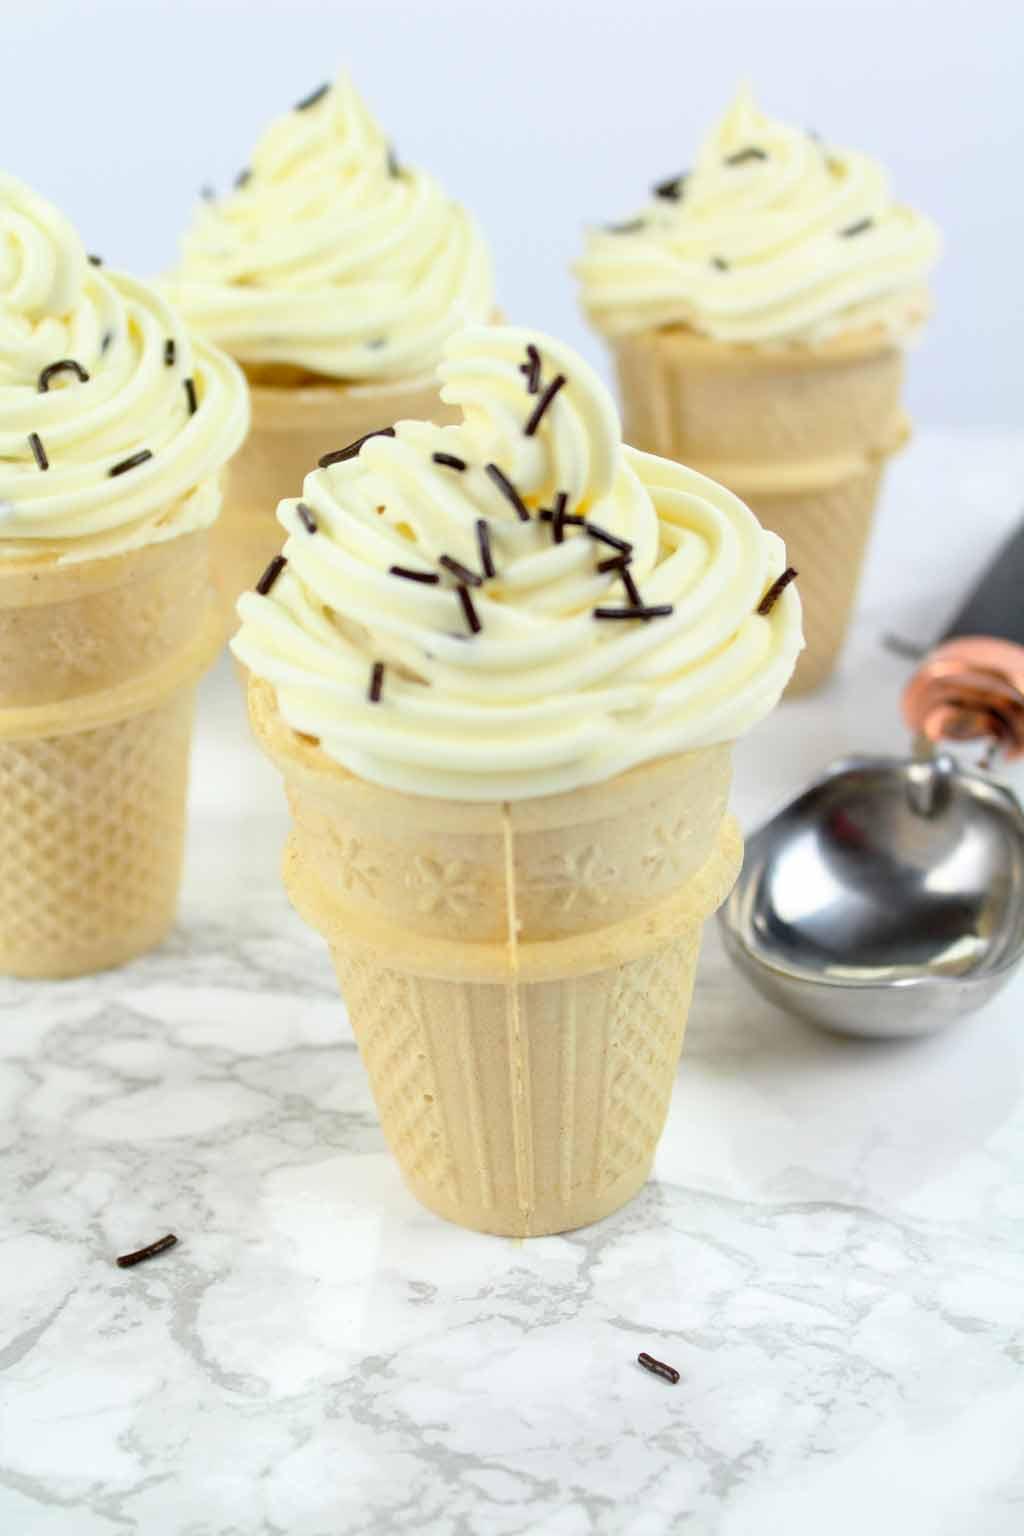 Ice cream cone cupcakes beside an ice cream scoop